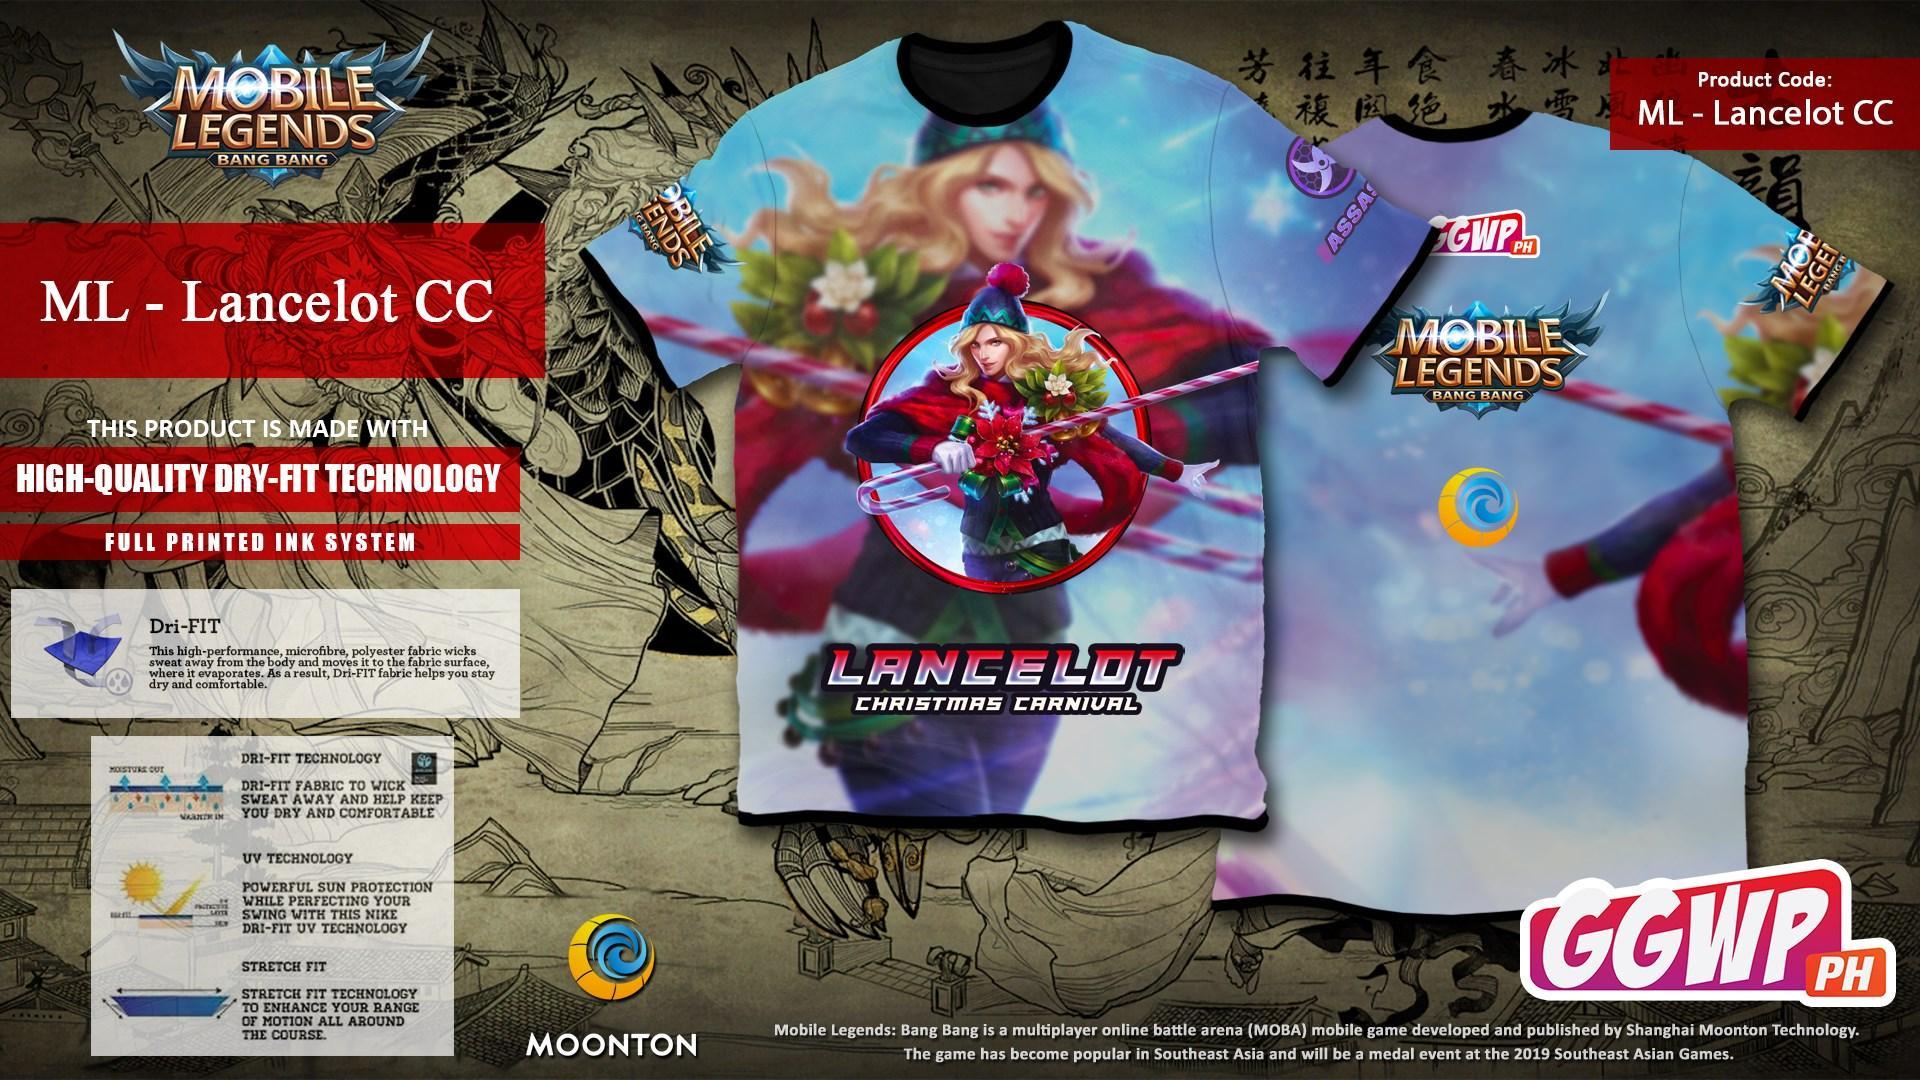 Christmas Carnival Lancelot.Ggwp Mobile Legends Full Printed Dry Fit Tshirt Jersey Lancelot